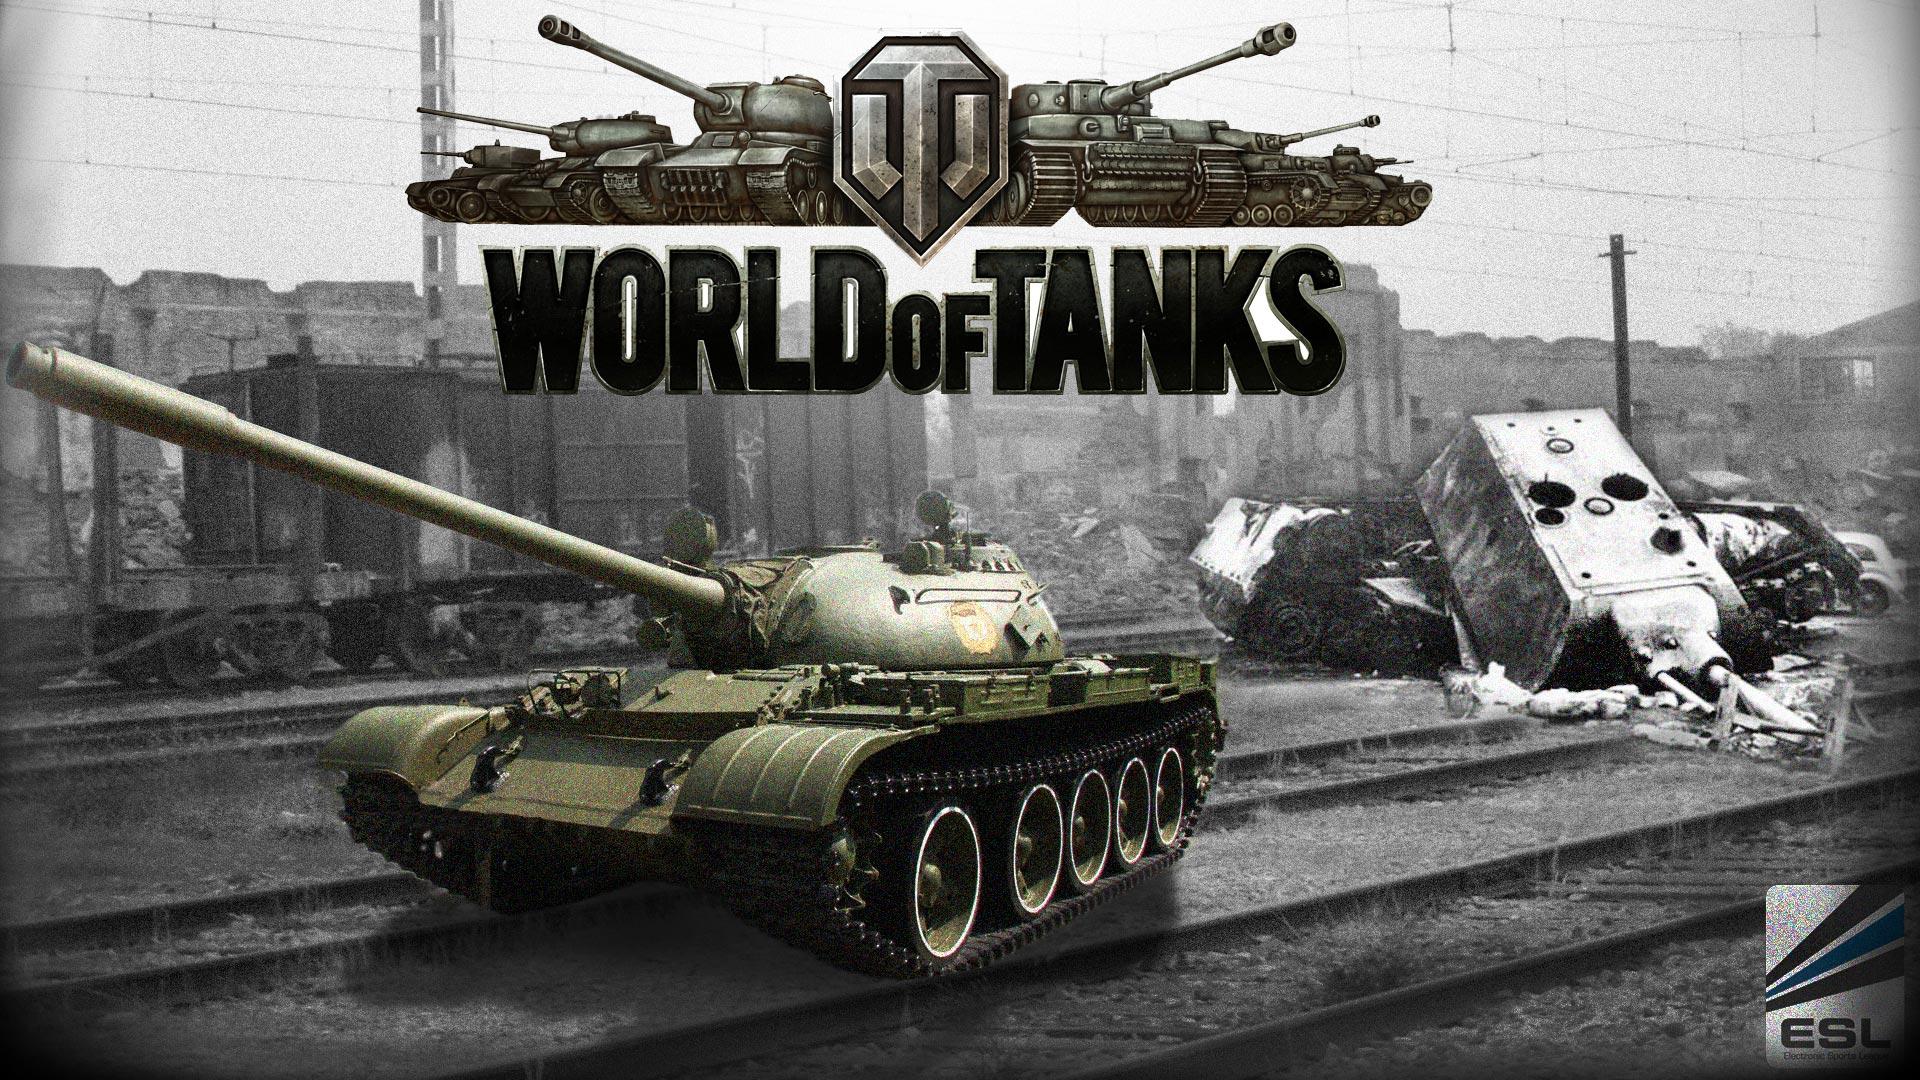 скачать обои world of tanks на рабочий стол 1440х900